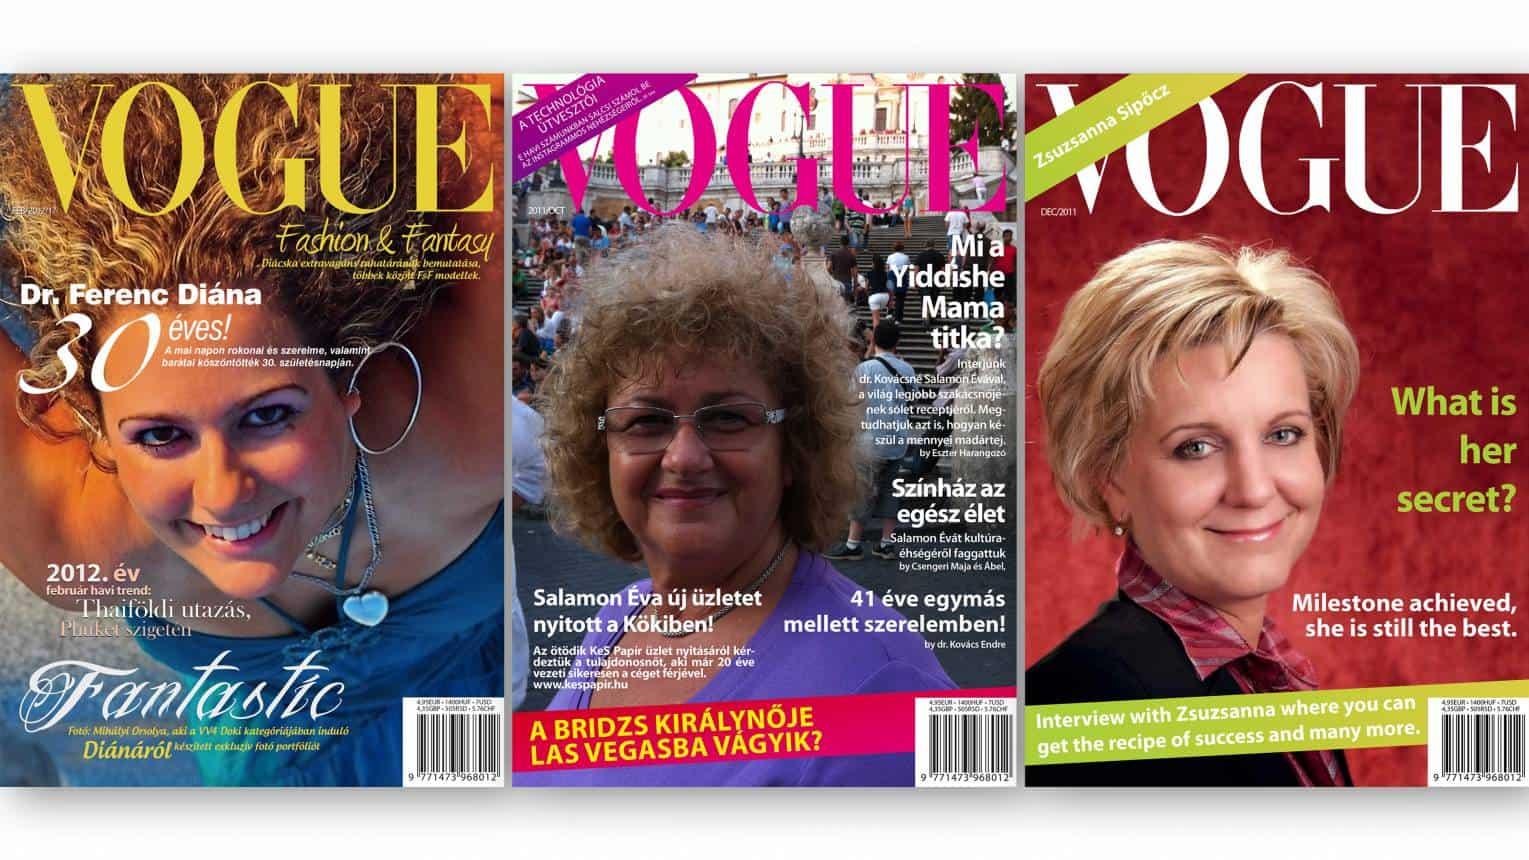 Barátnőd, kedvesed a Vogue címlapján